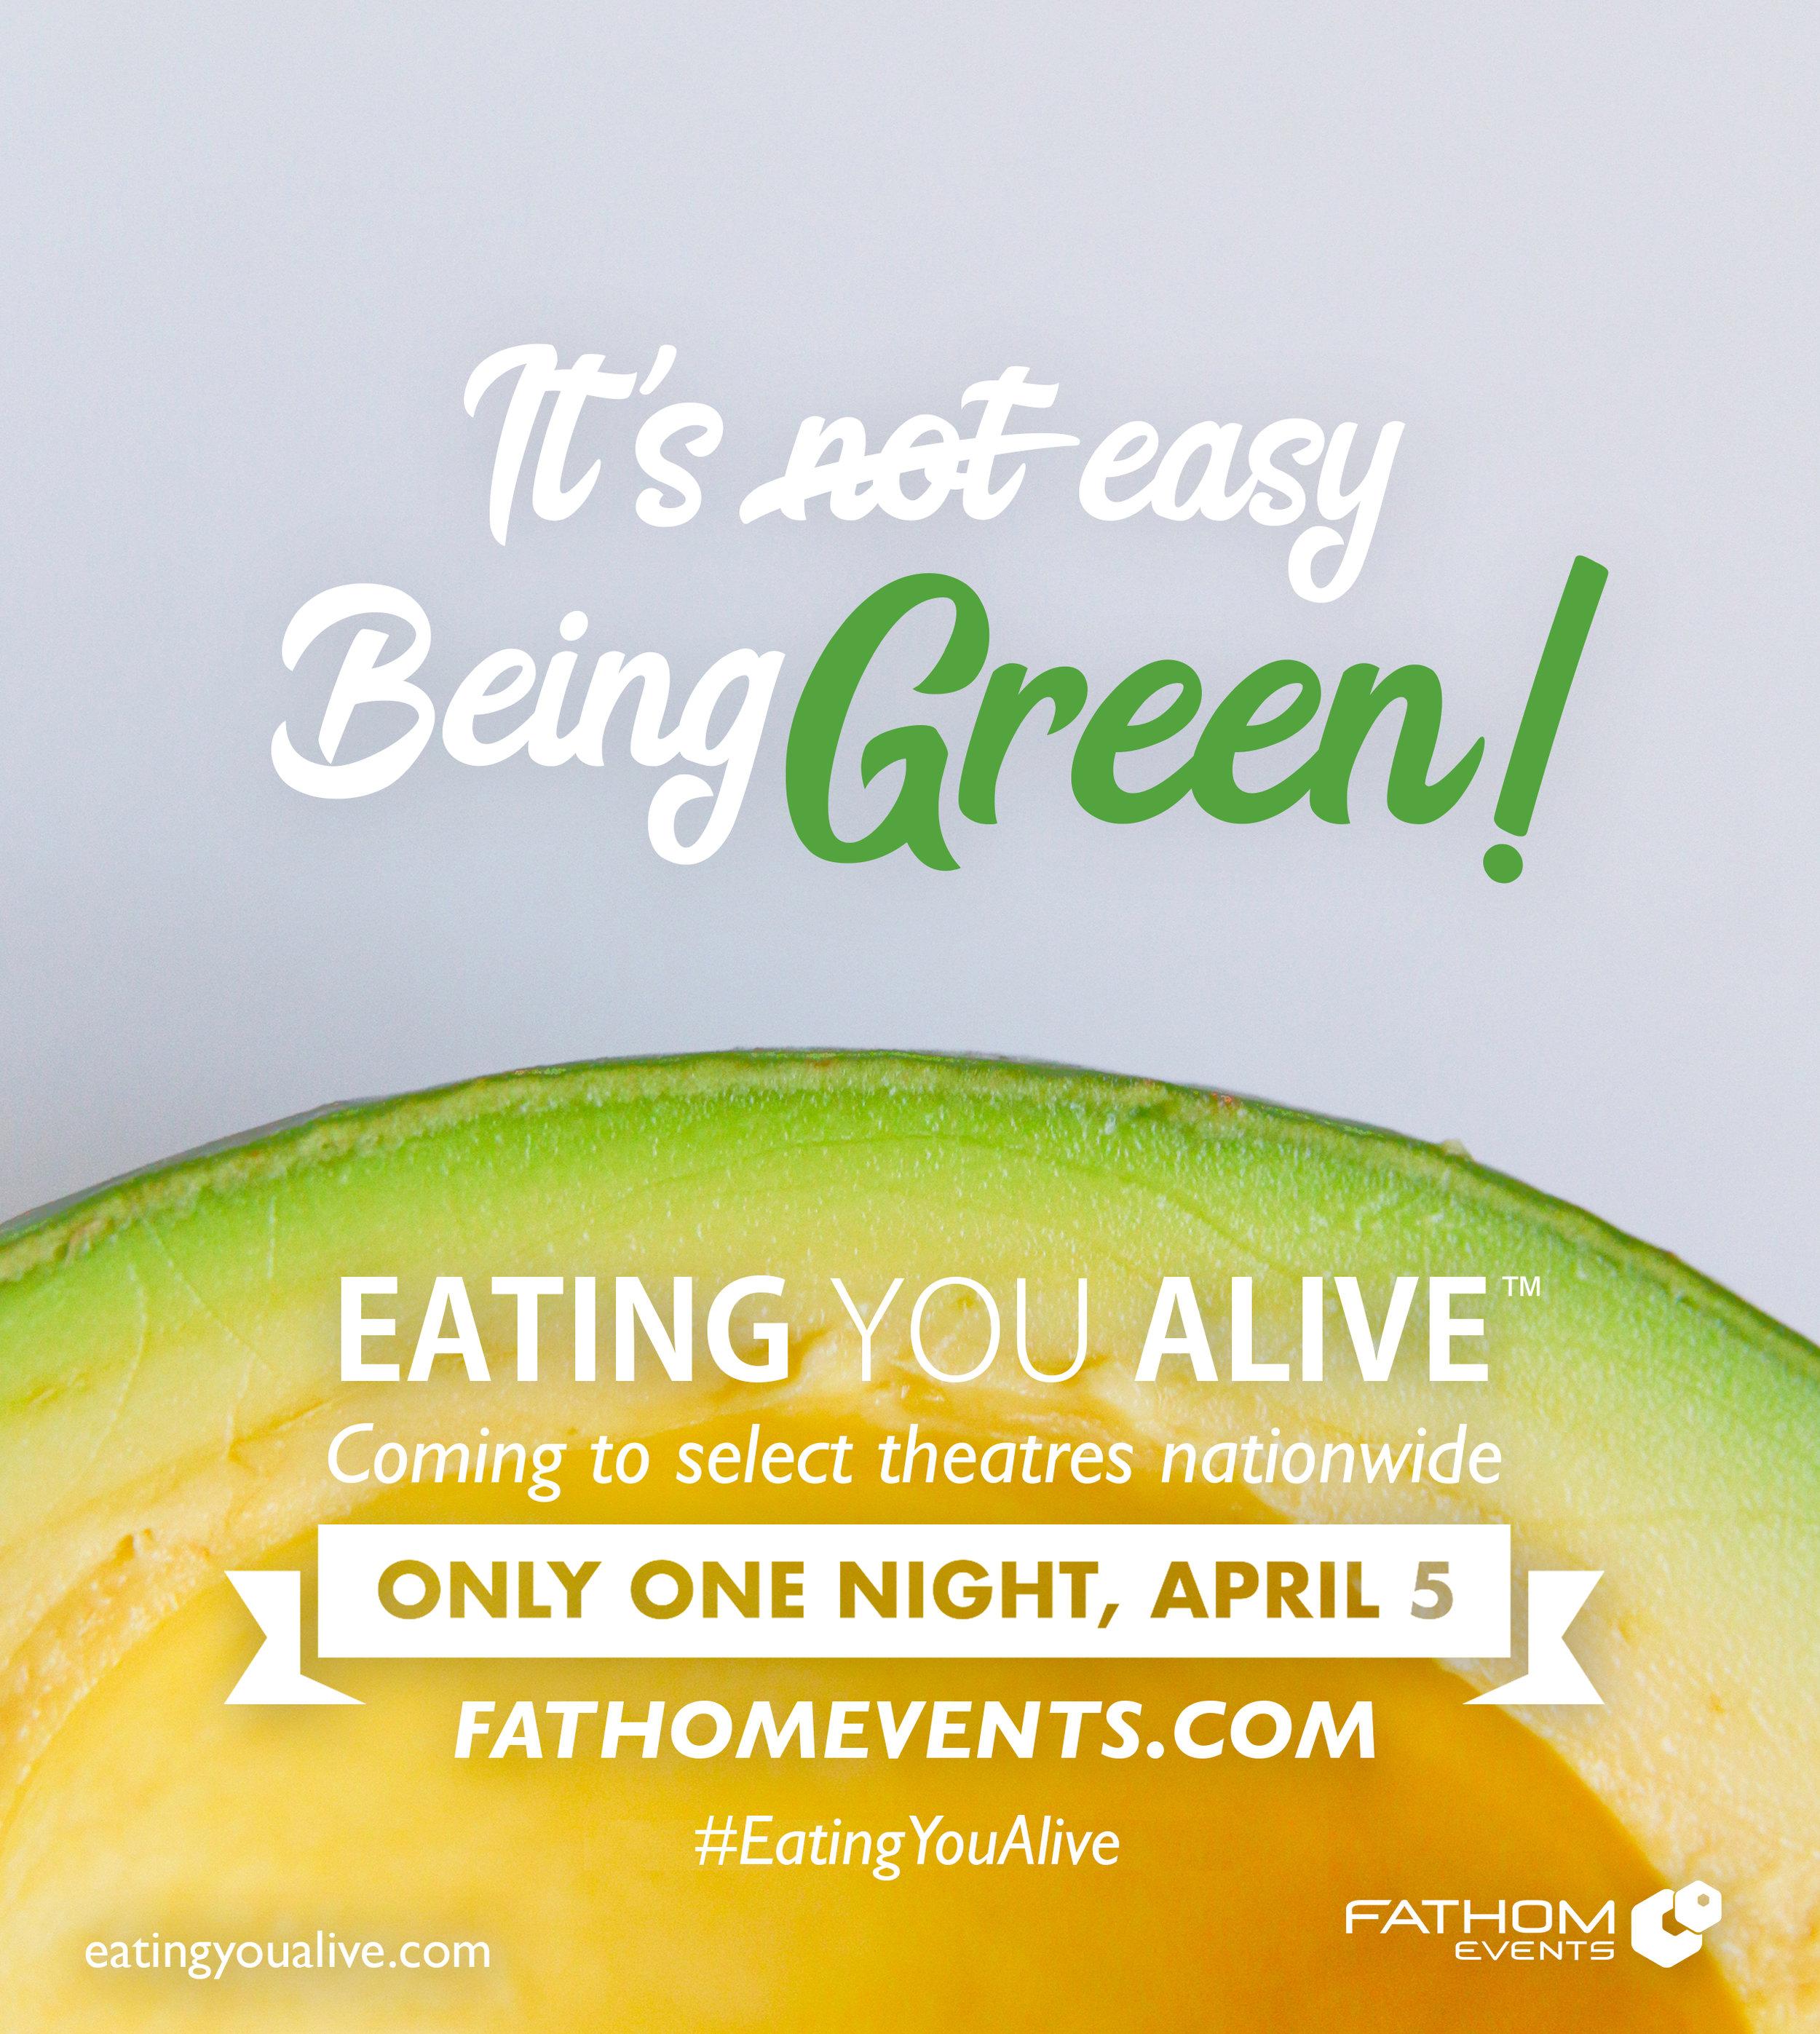 EYA_its_easy_being_green.jpg